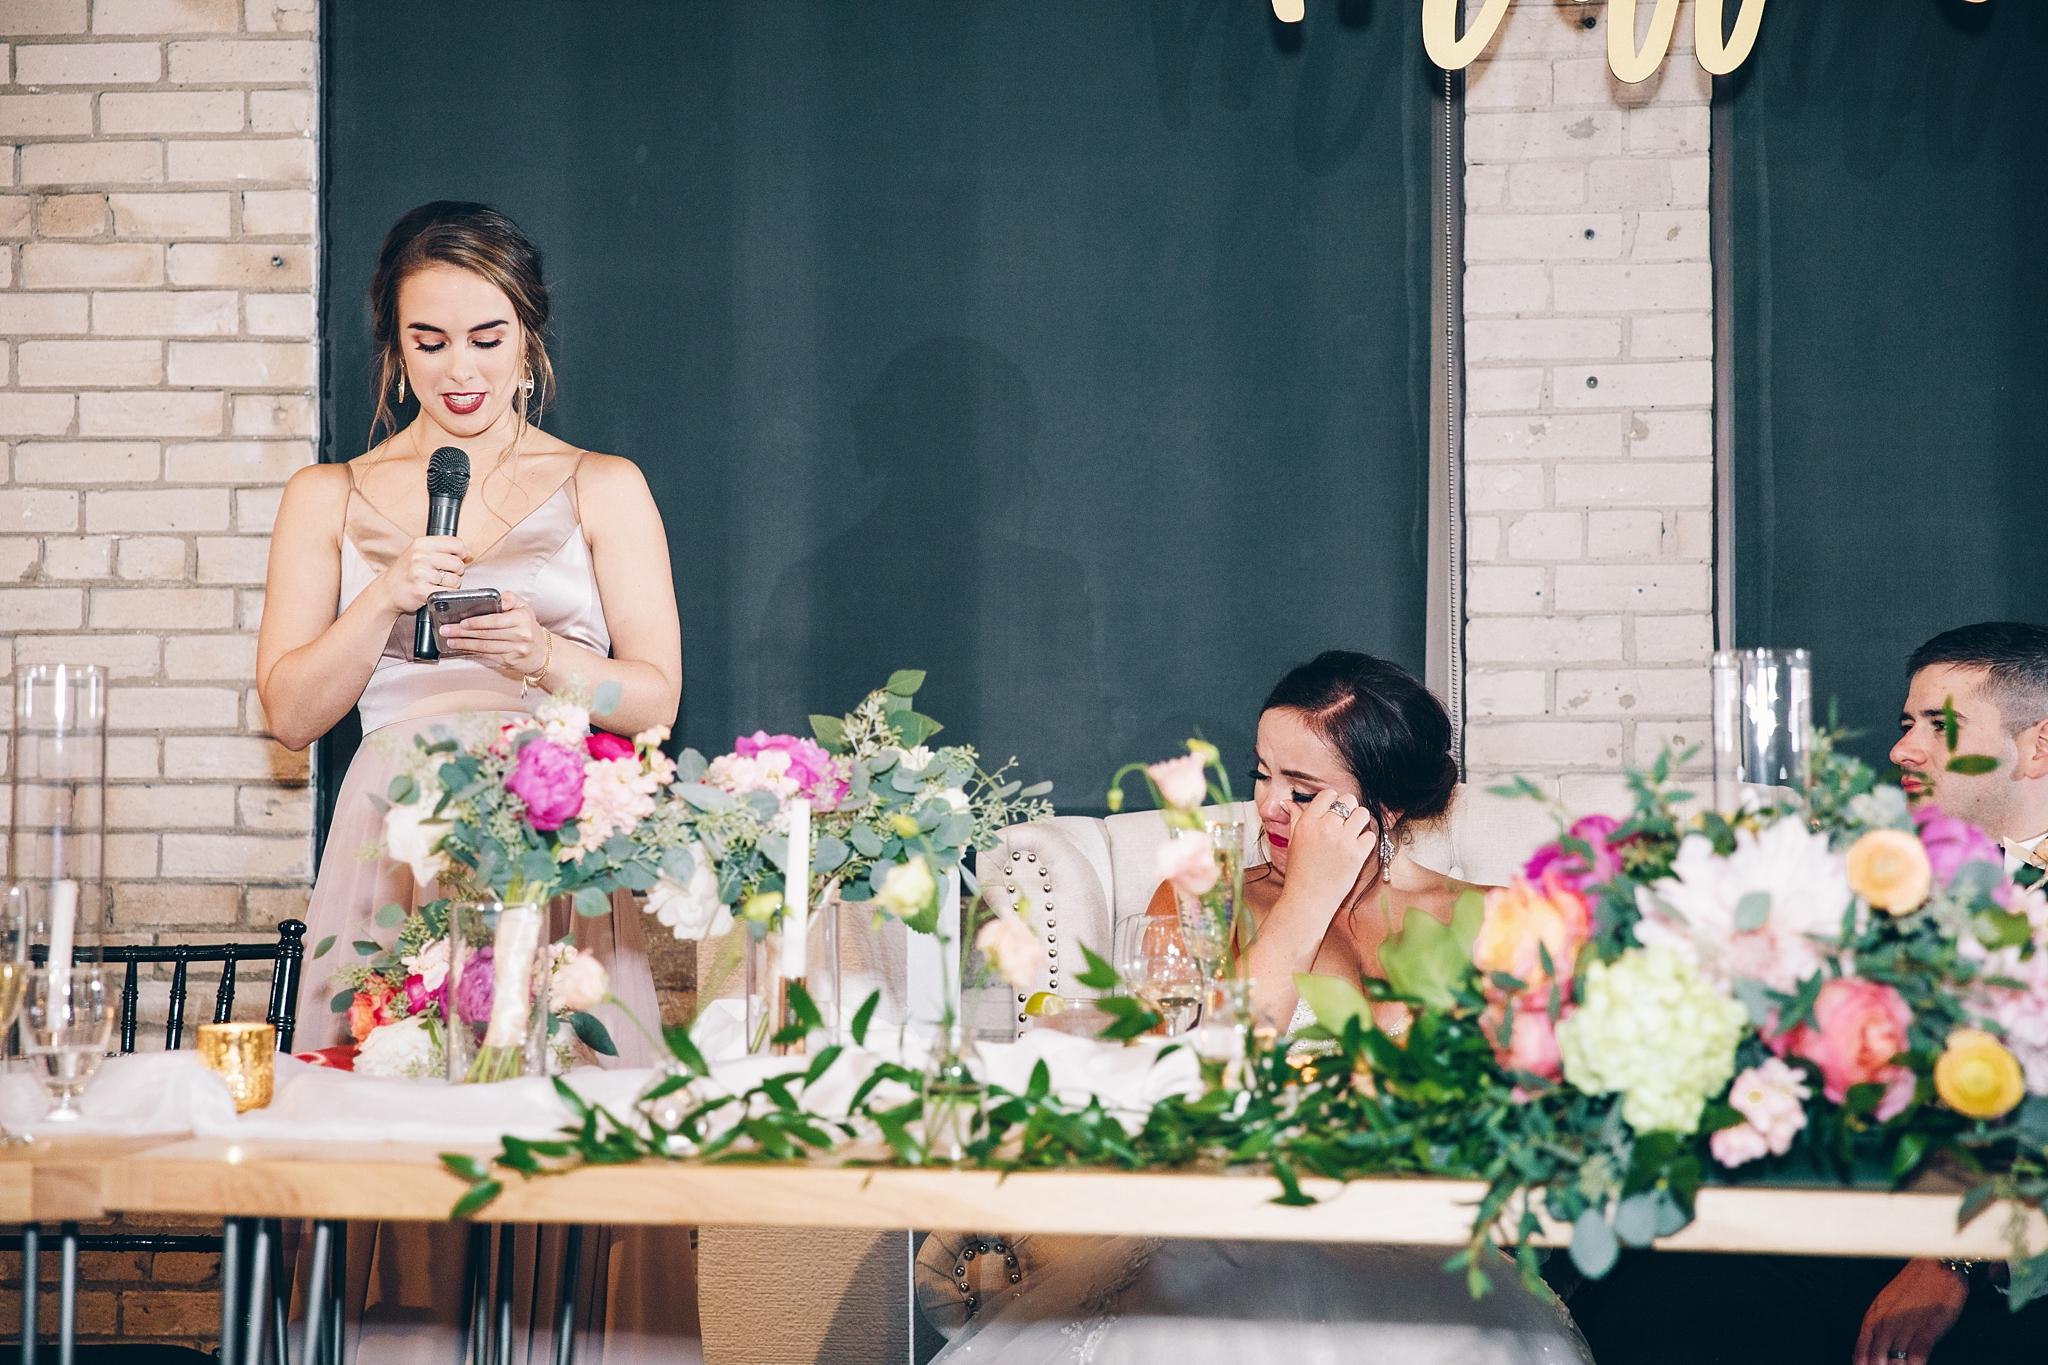 baker-lofts-holland-michigan-wedding-photographer_0390.jpg